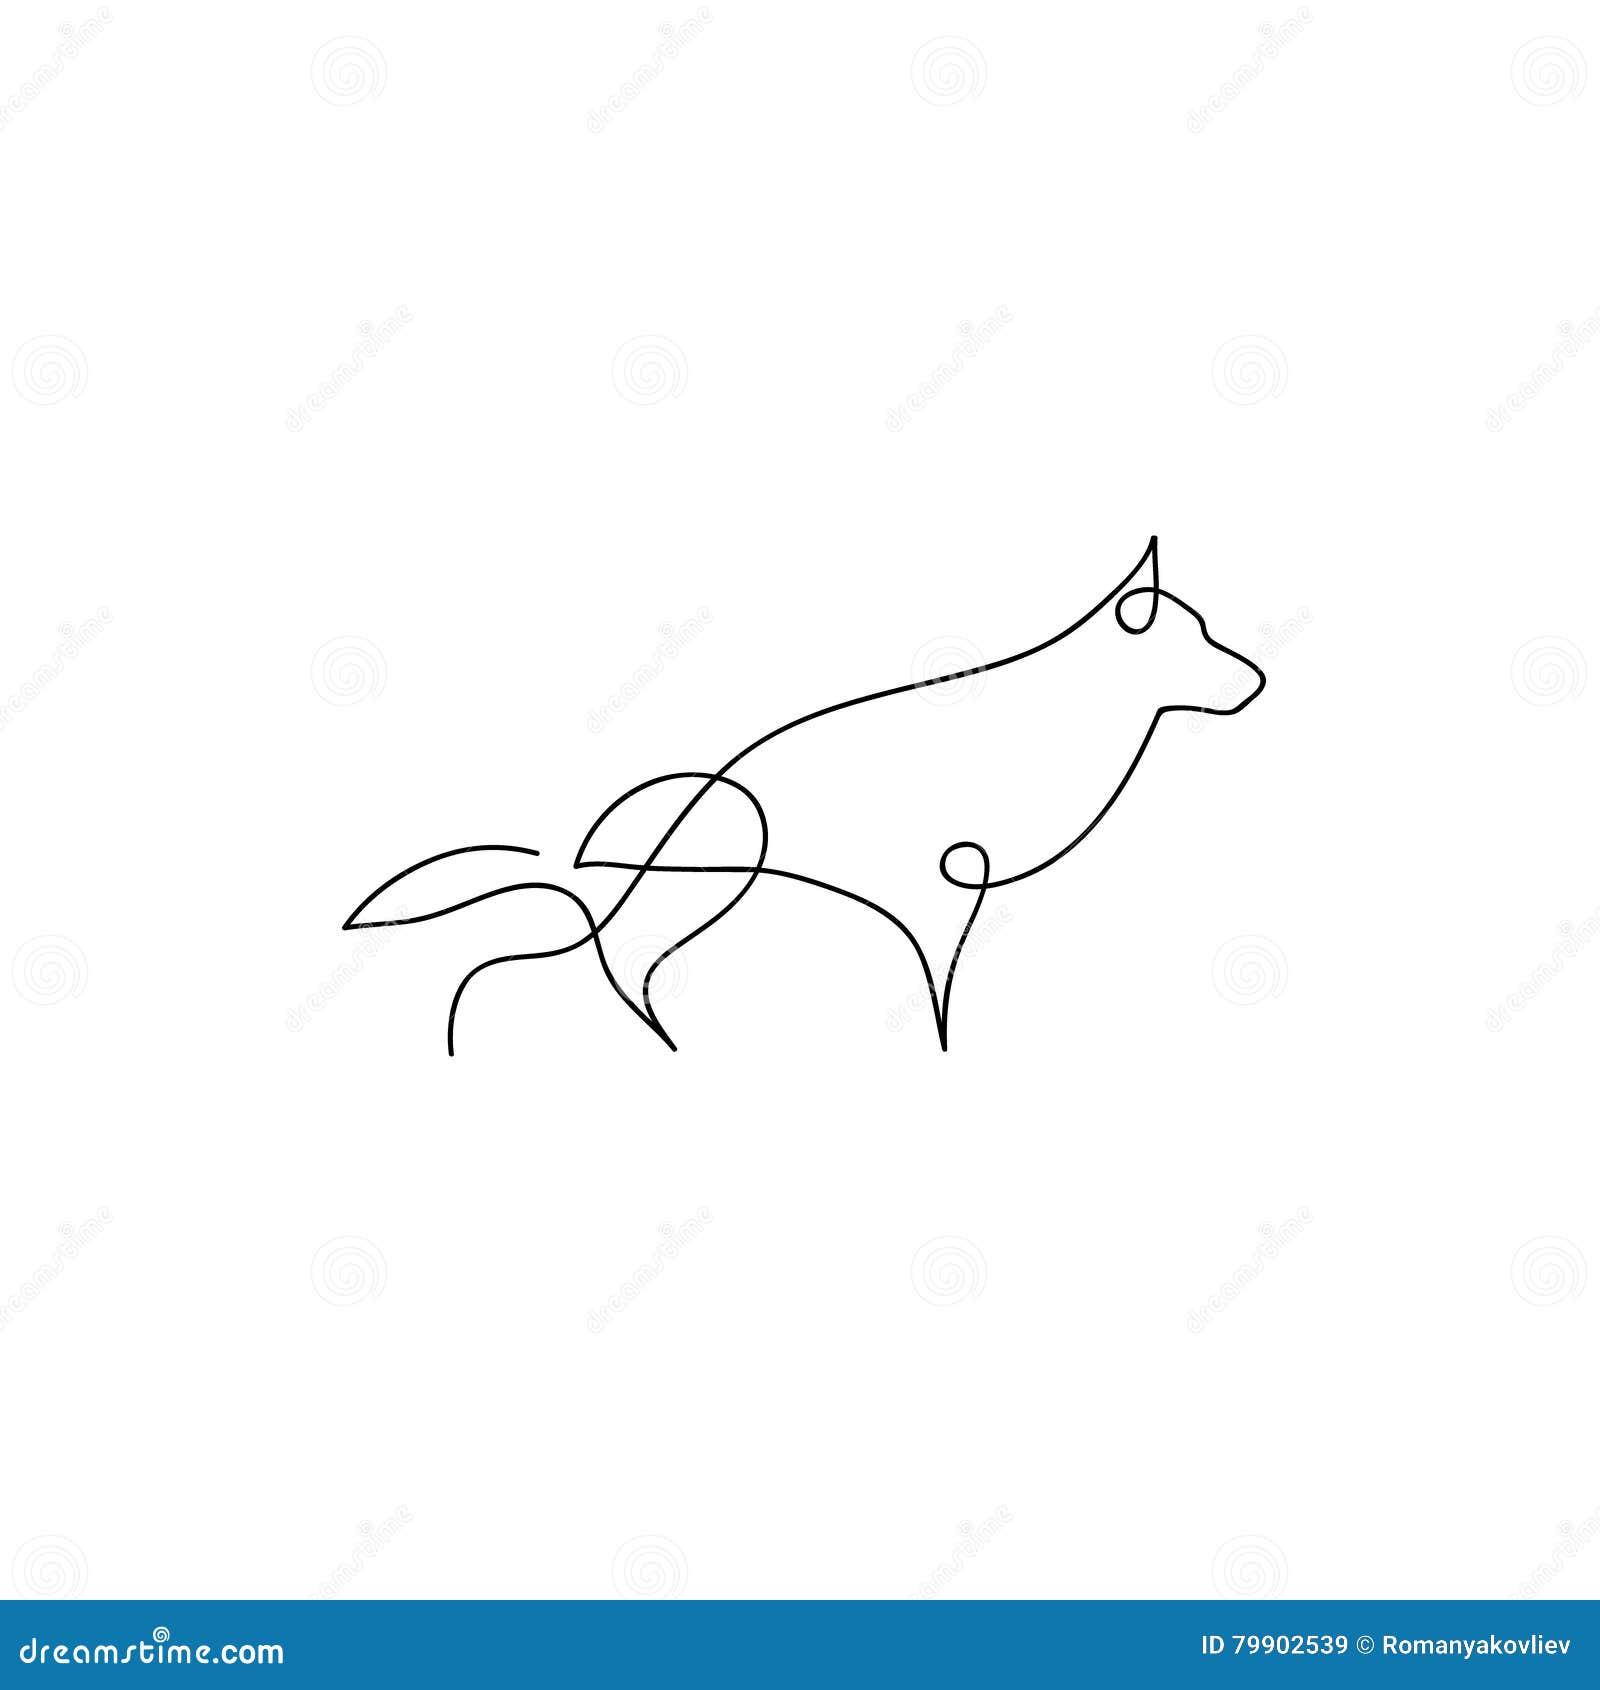 Line Art Dog Tattoo : One line dog design silhouette german shepherd hand